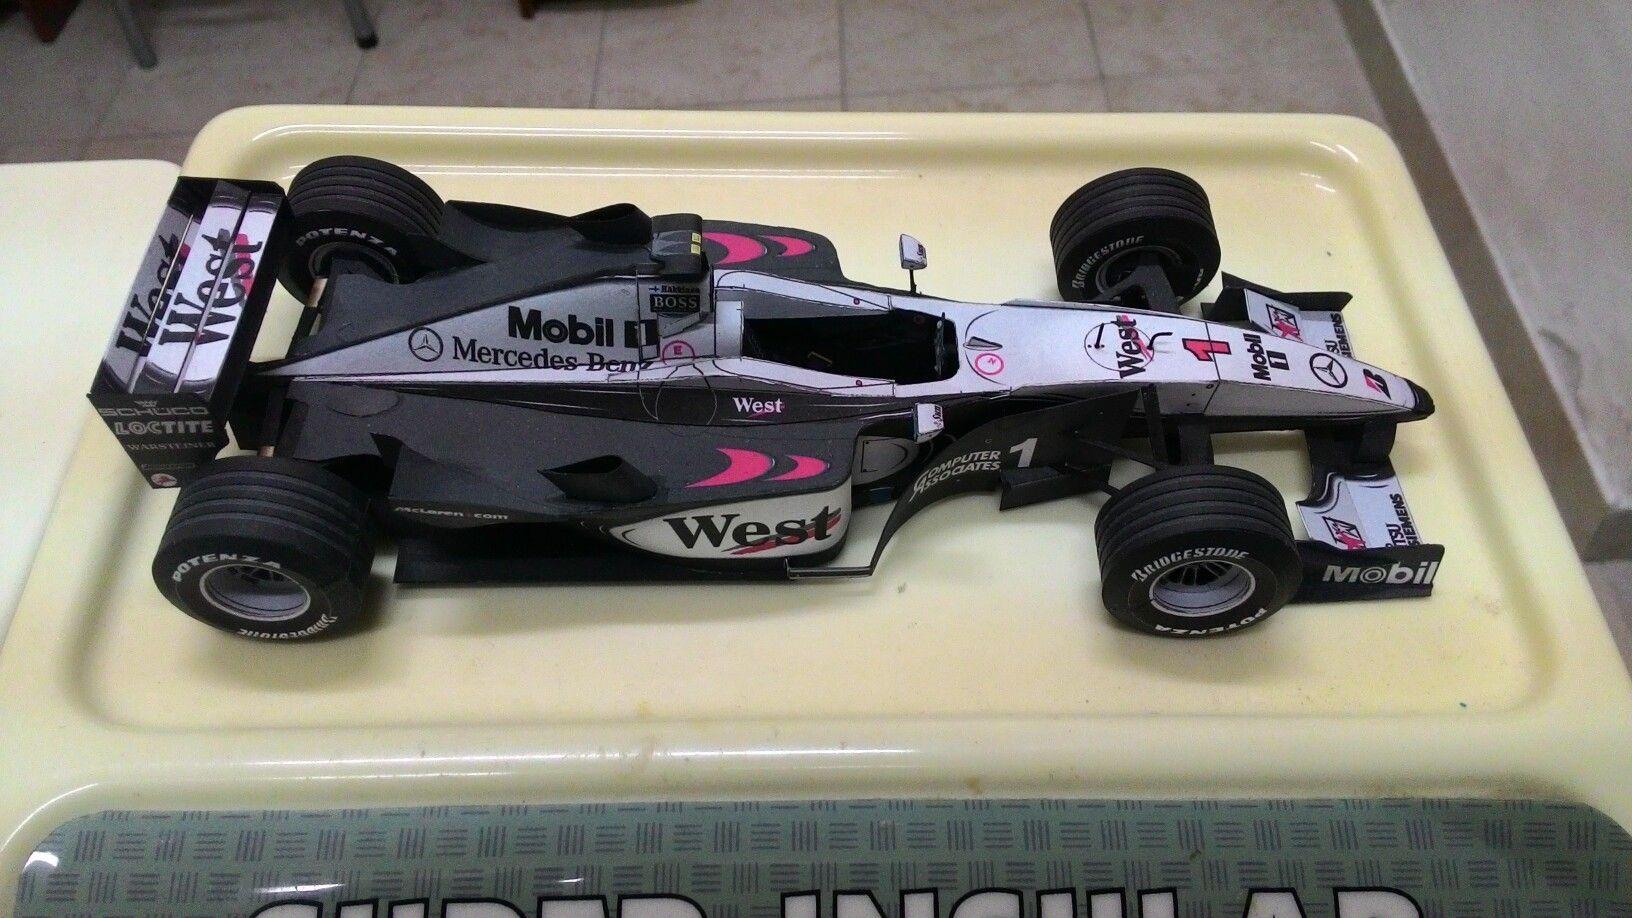 McLaren MP4/15 papermodel. #formula1 #papermodel #papercraft #McLaren